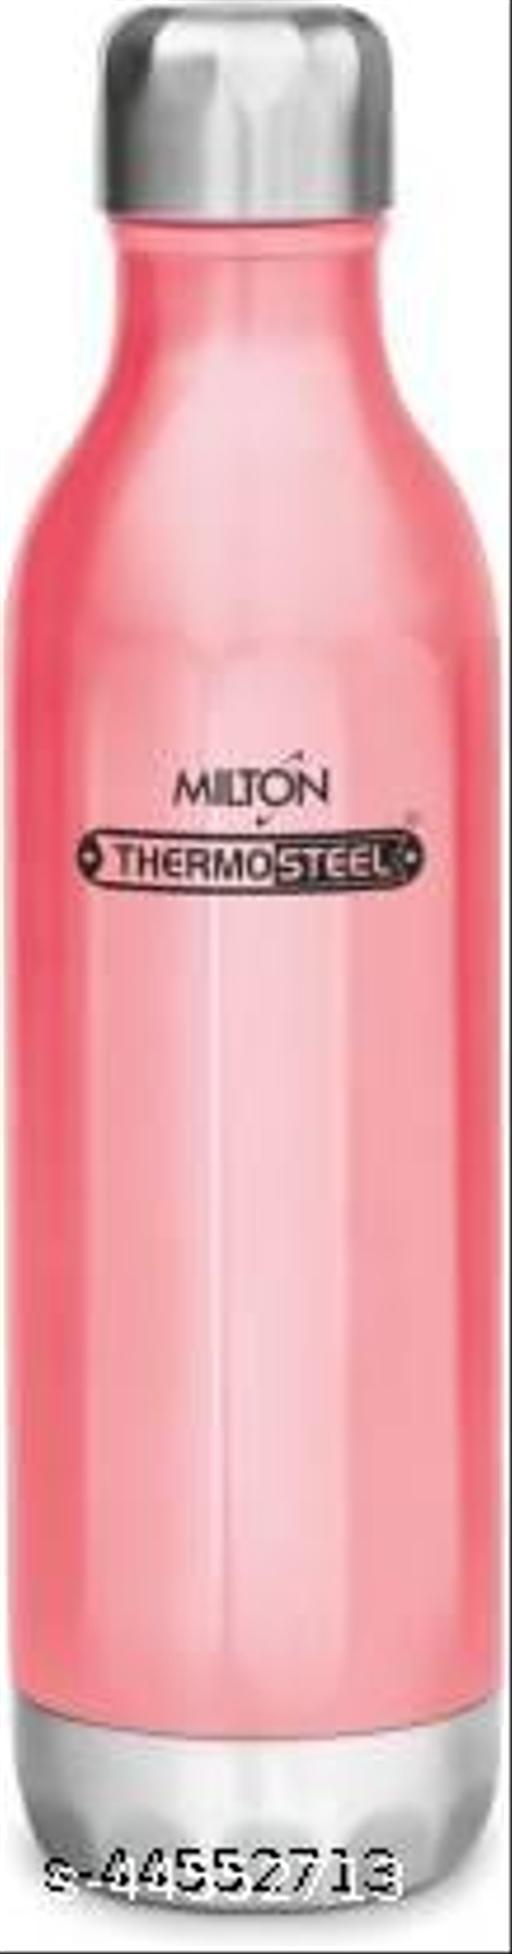 Milton Bliss 900 (790 ml) Bottle- Pink